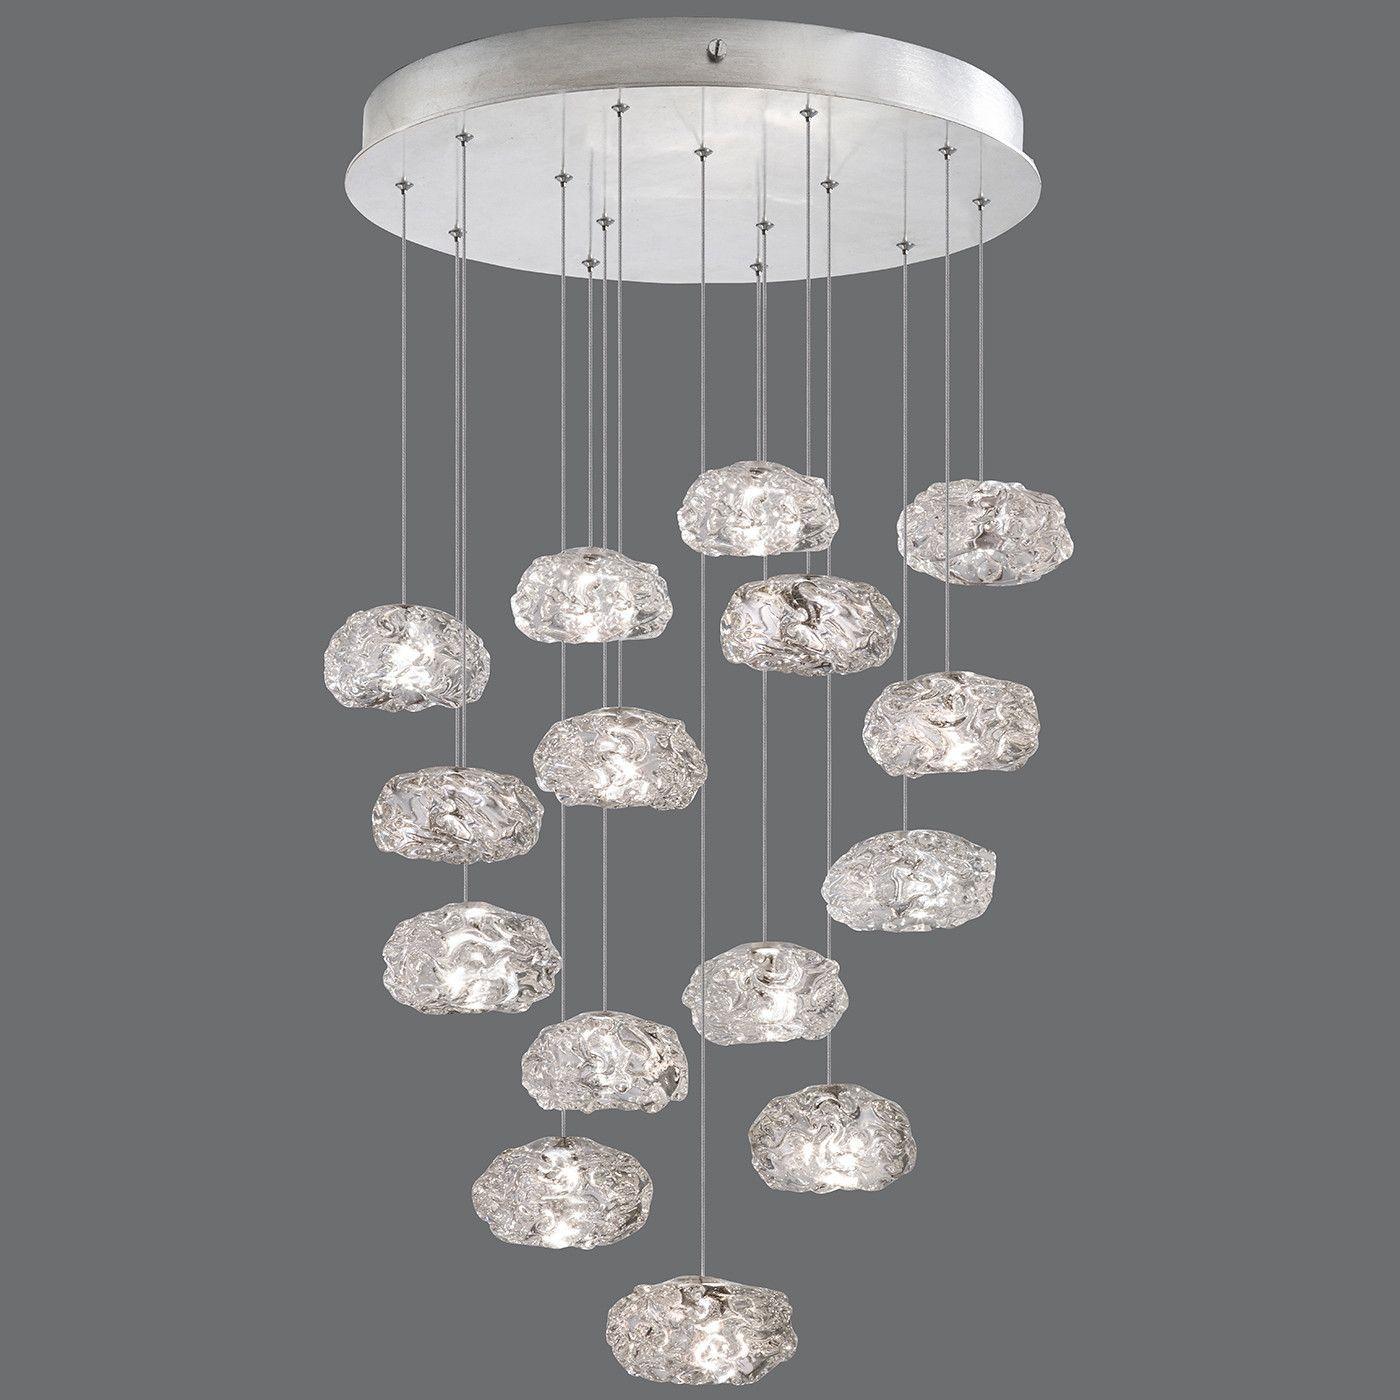 Fine art lamps natural inspirations 15 lights silver leaf chandelier fine art lamps natural inspirations 15 lights silver leaf chandelier arubaitofo Choice Image